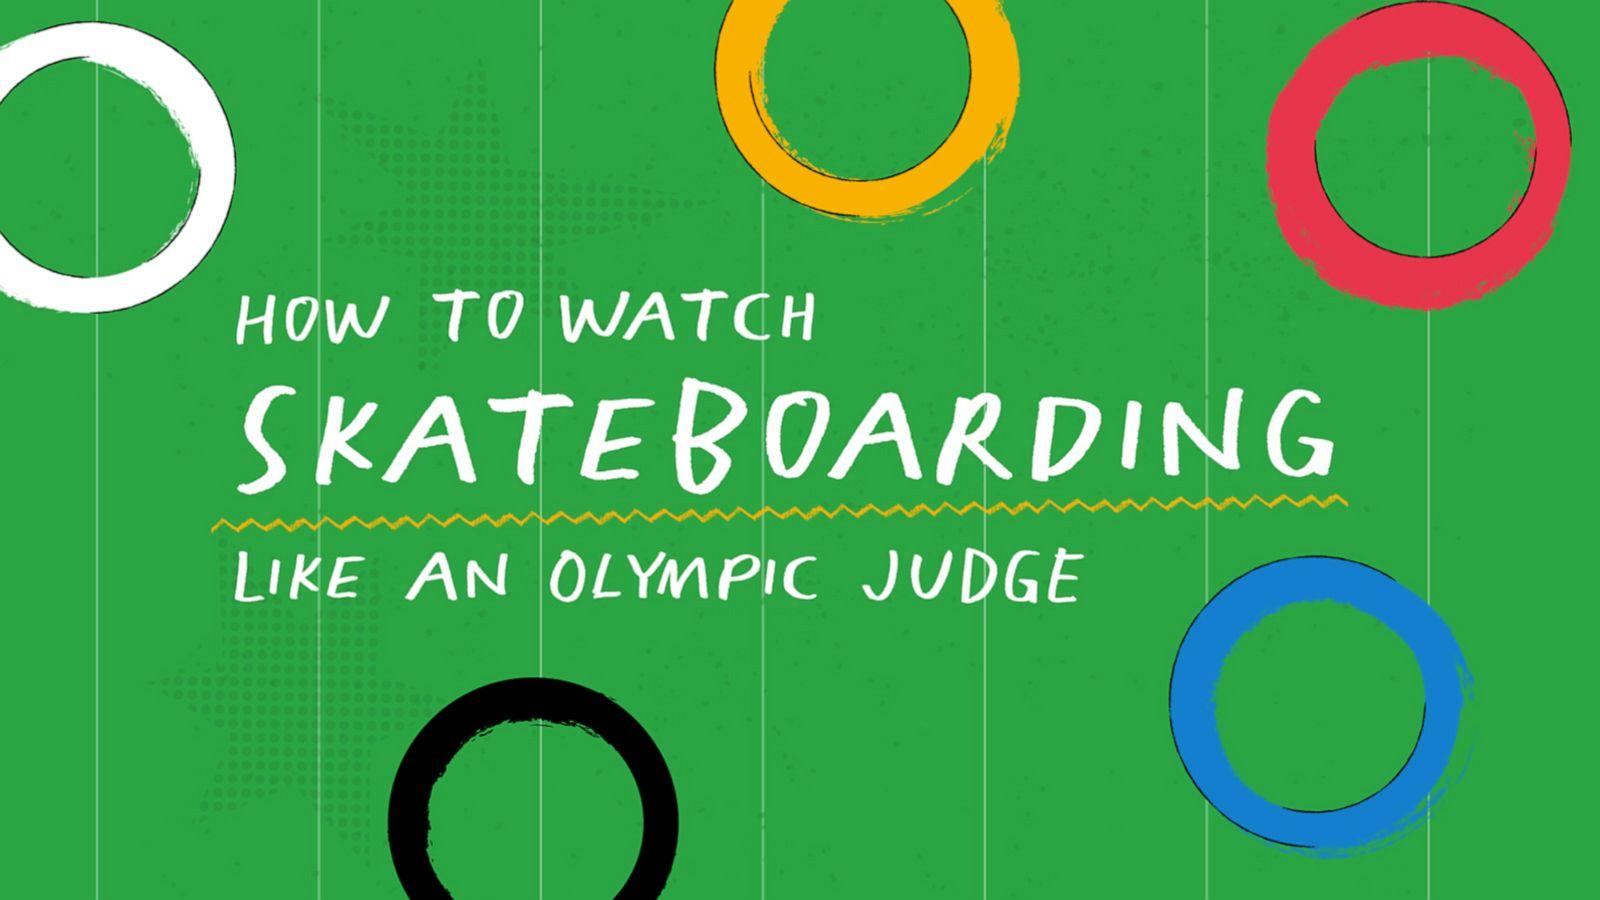 How to watch skateboarding like an Olympic judge | FiveThirtyEight